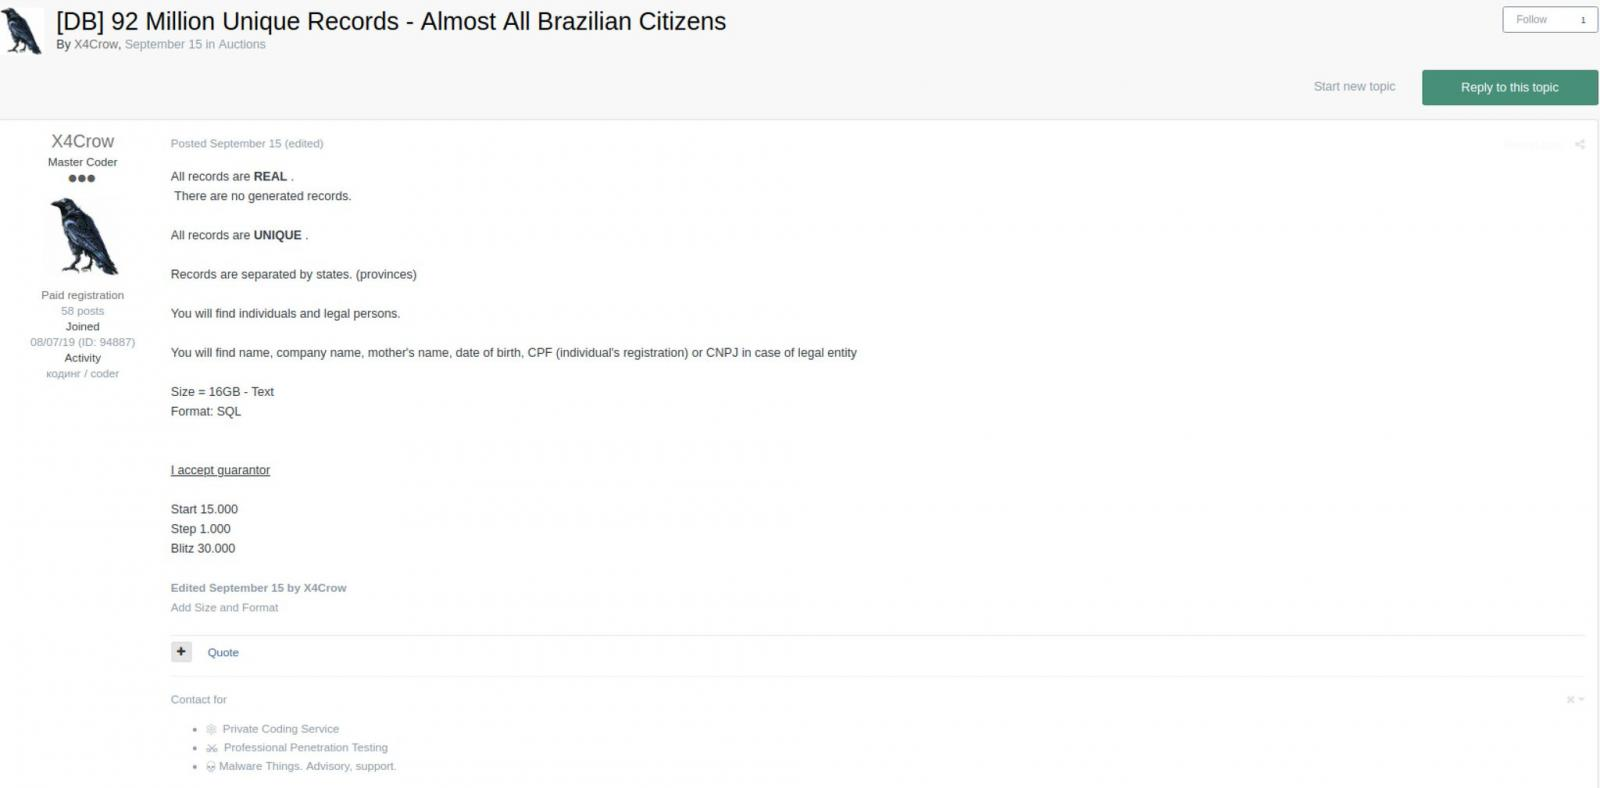 AuctionBrDB-X4Crow